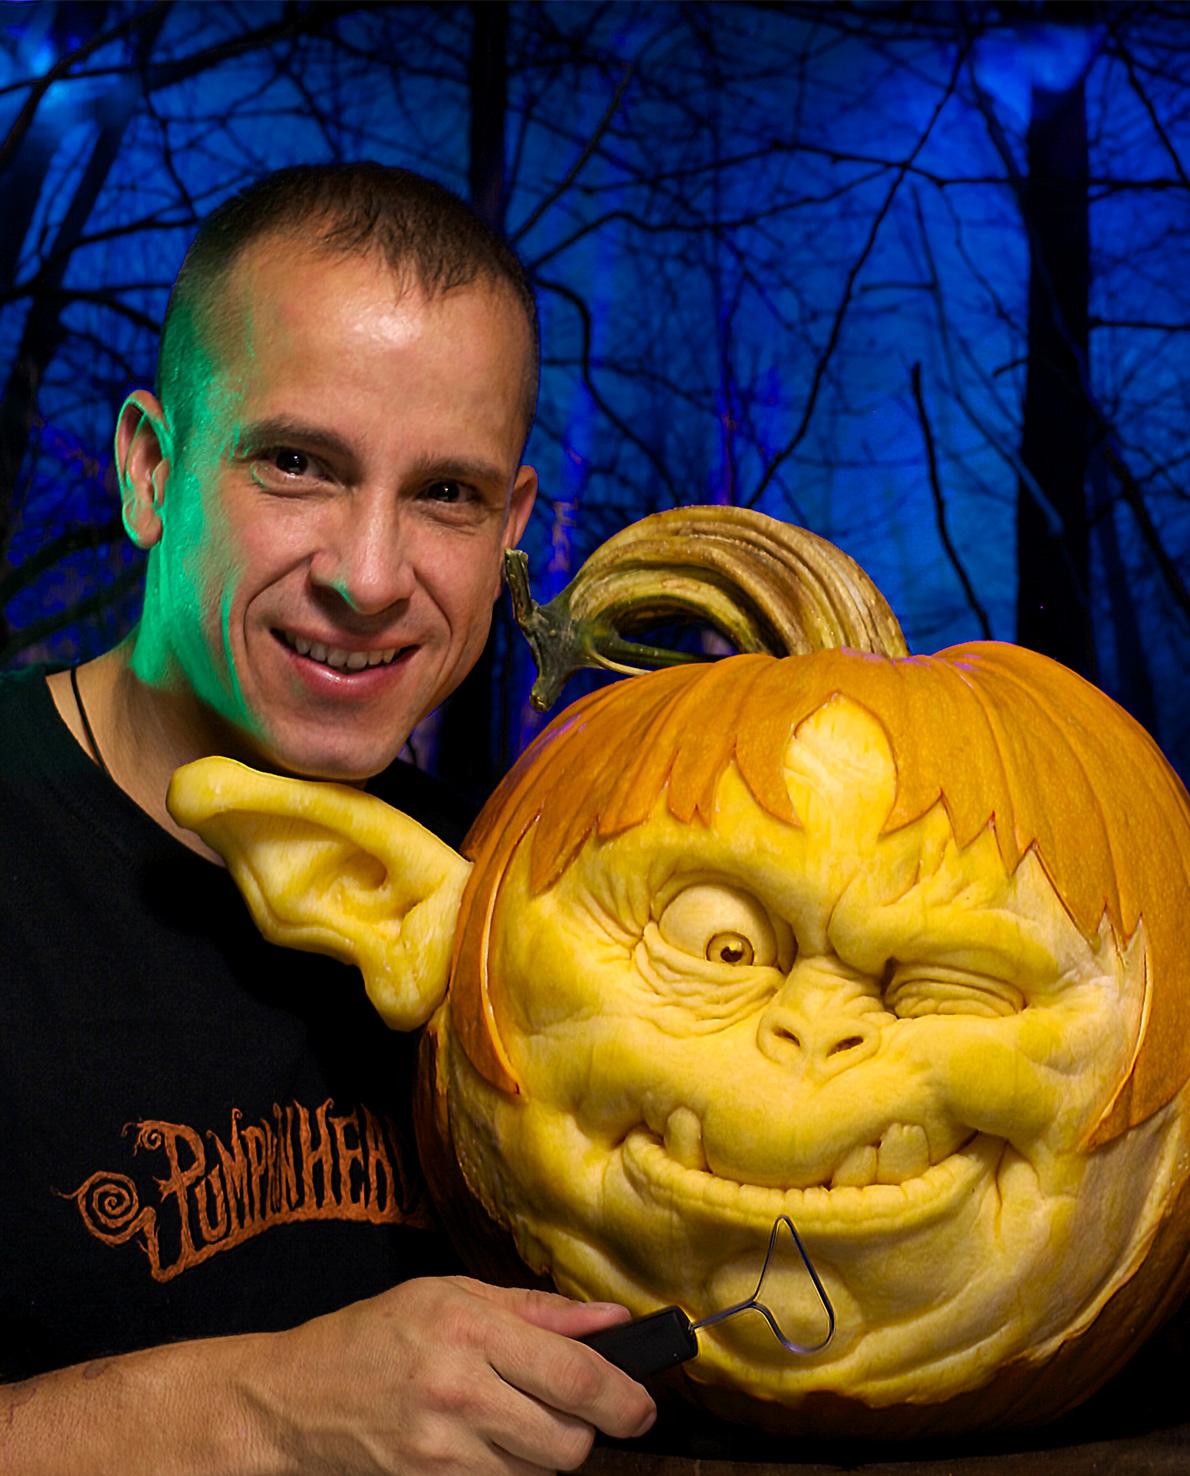 Kürbiskünstler Ray Villafane Studios USA Künstler Halloween Kürbis Skulpturen Werkzeuge mit triangle